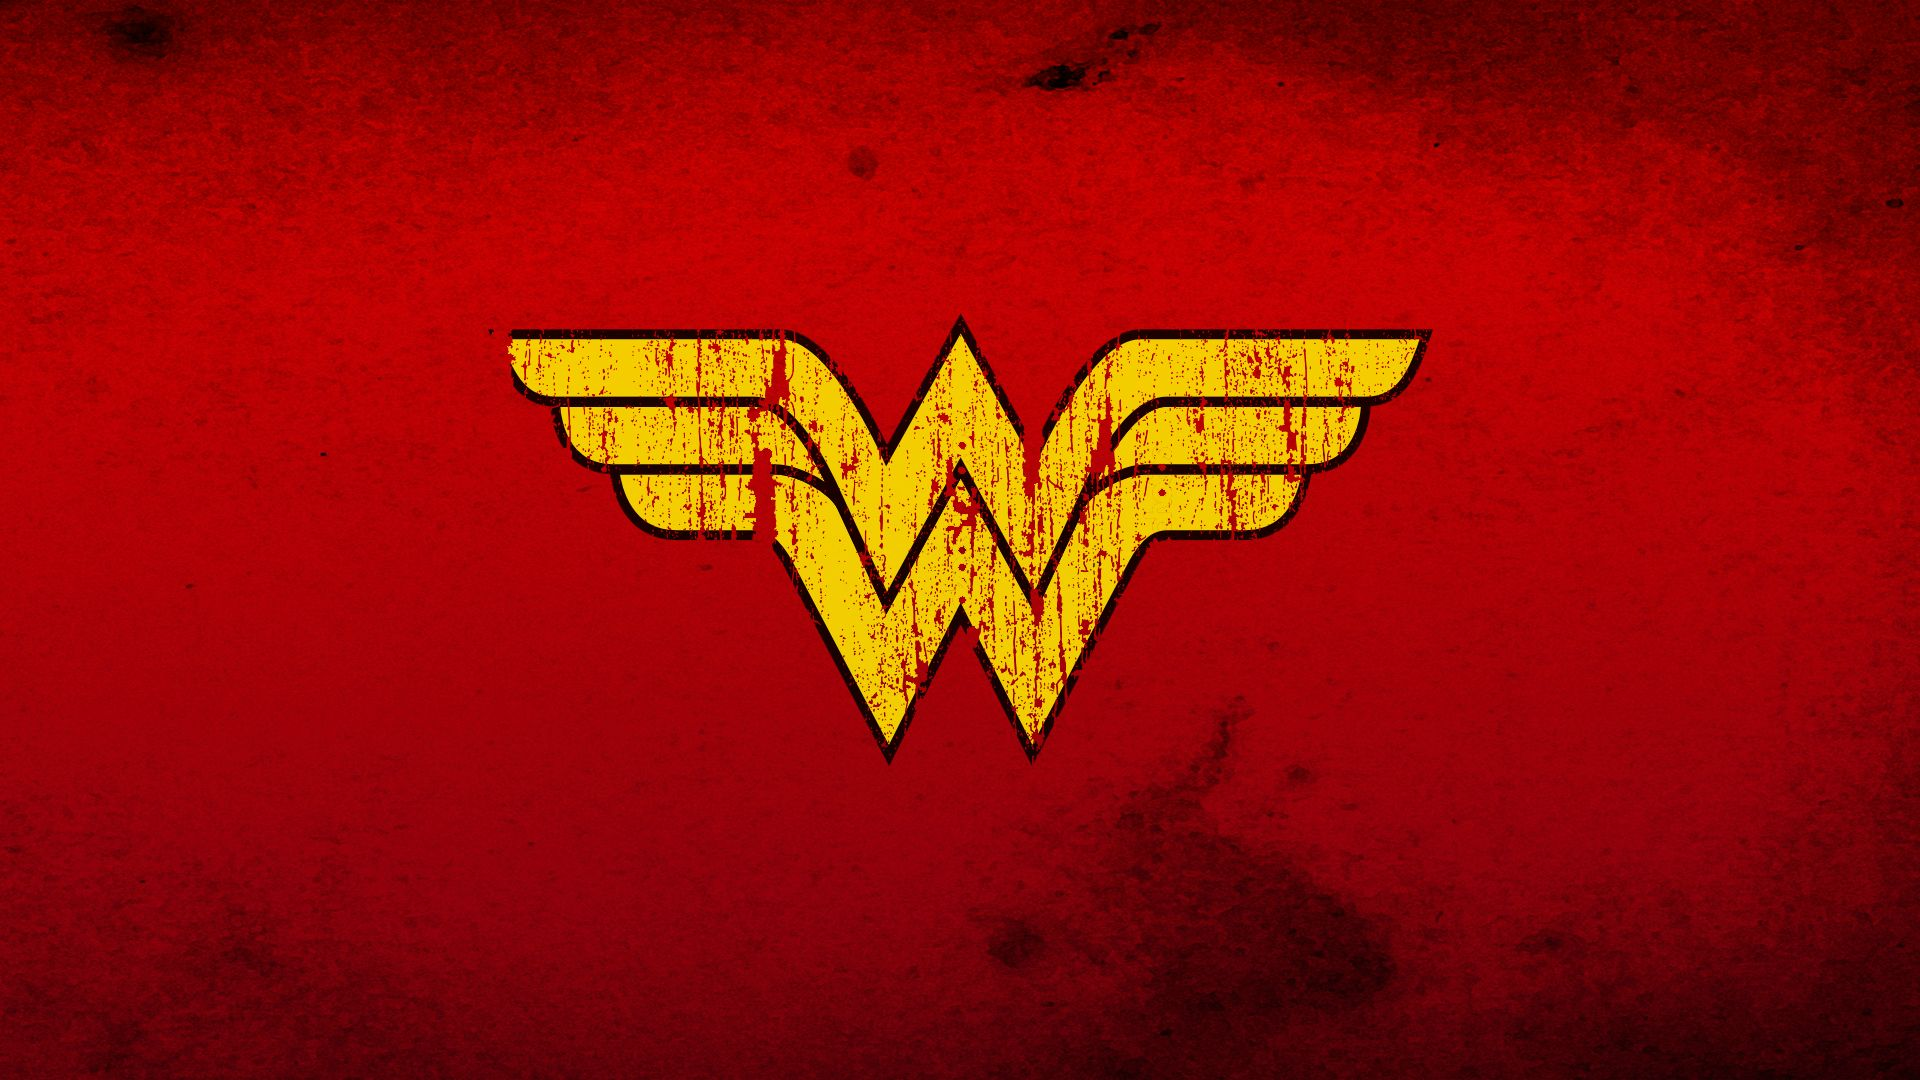 Wonder Woman Full HD Wallpaper and Background 1920x1080 1920x1080